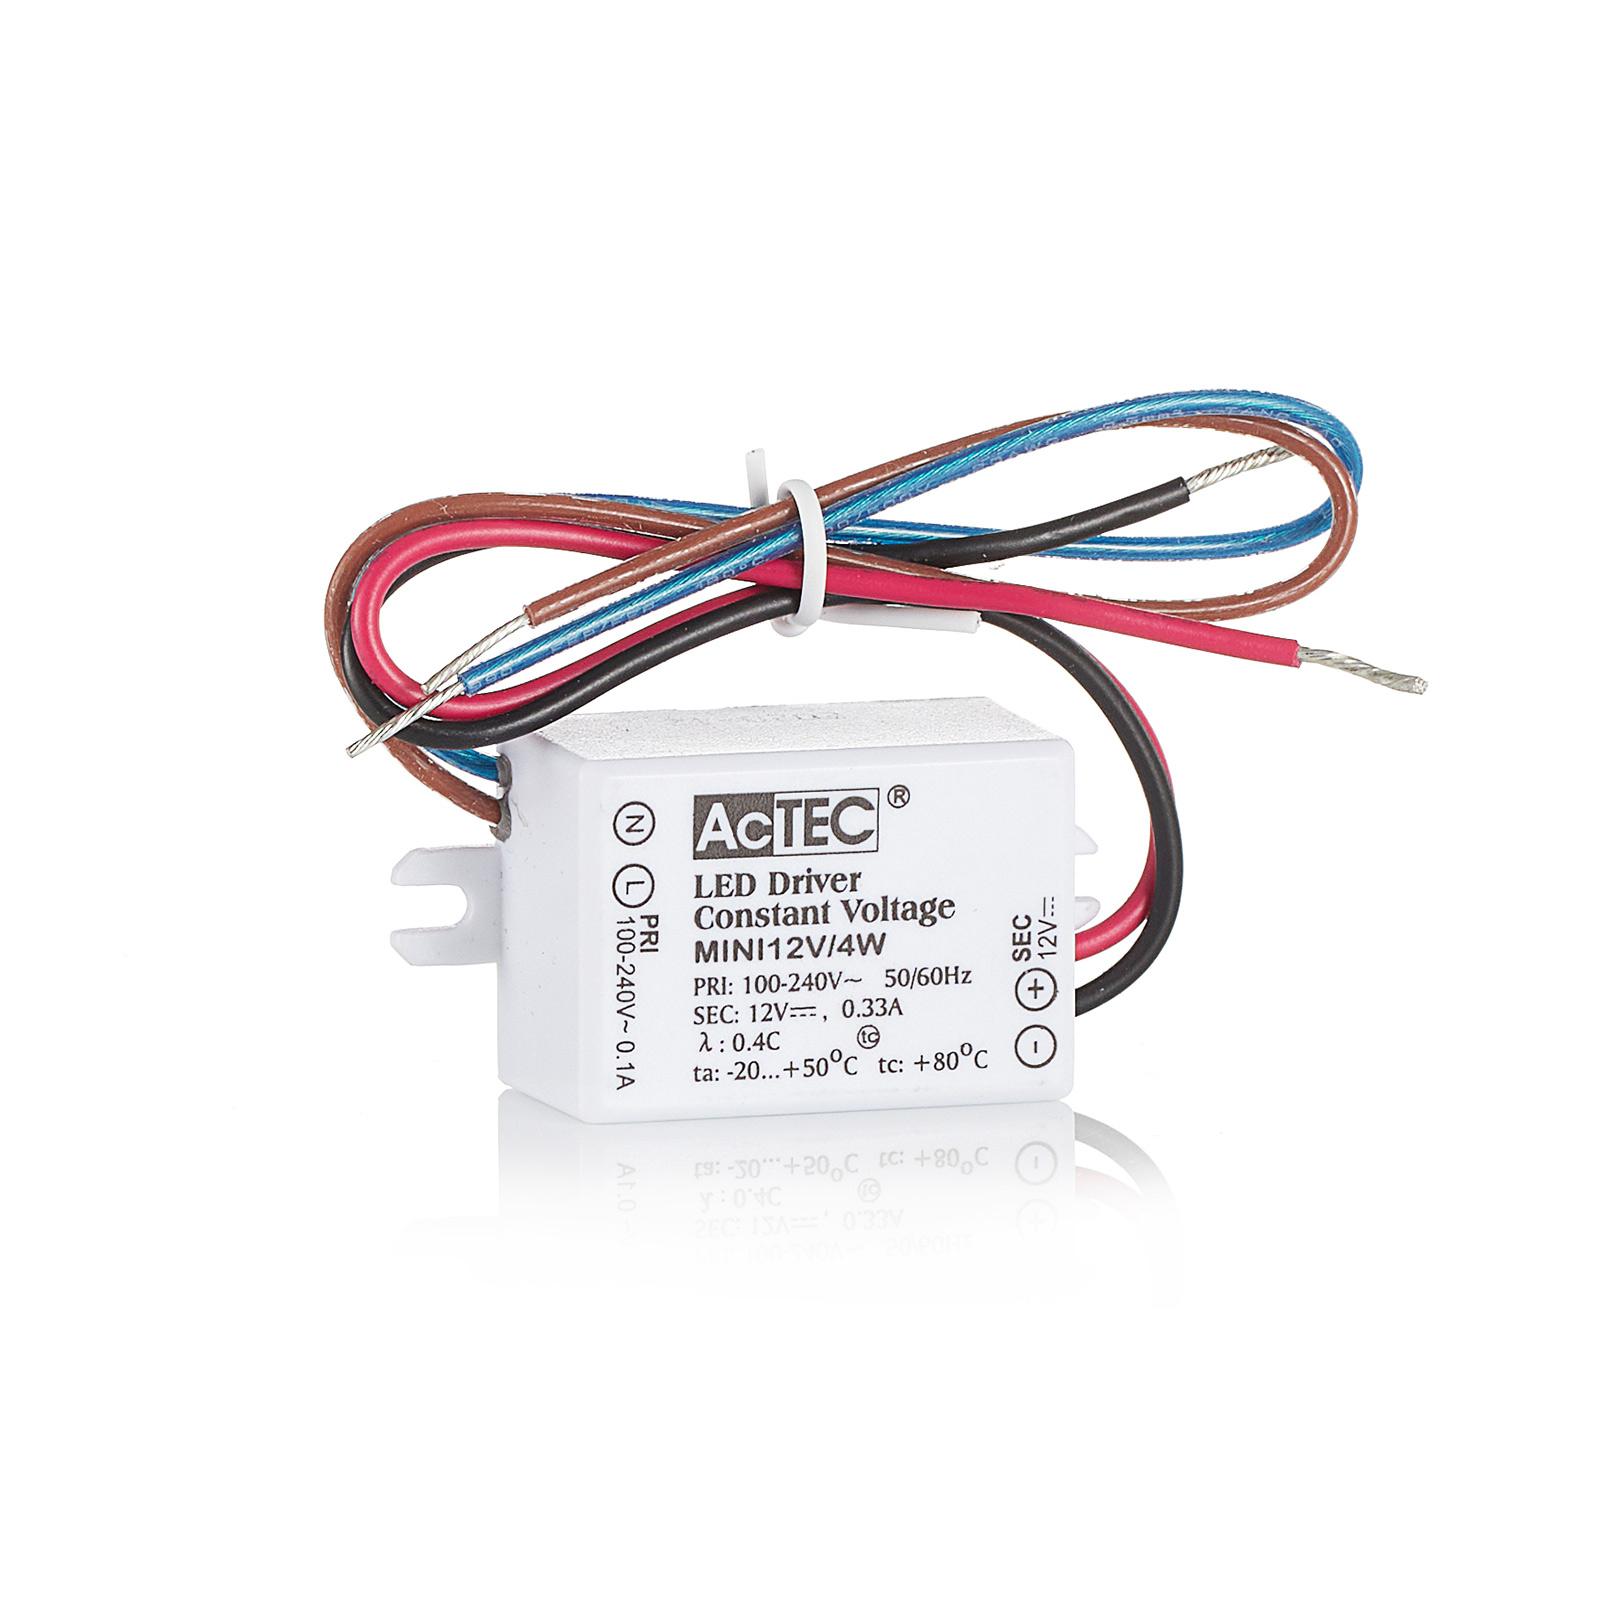 AcTEC Mini LED-Treiber CV 12V, 4W, IP65